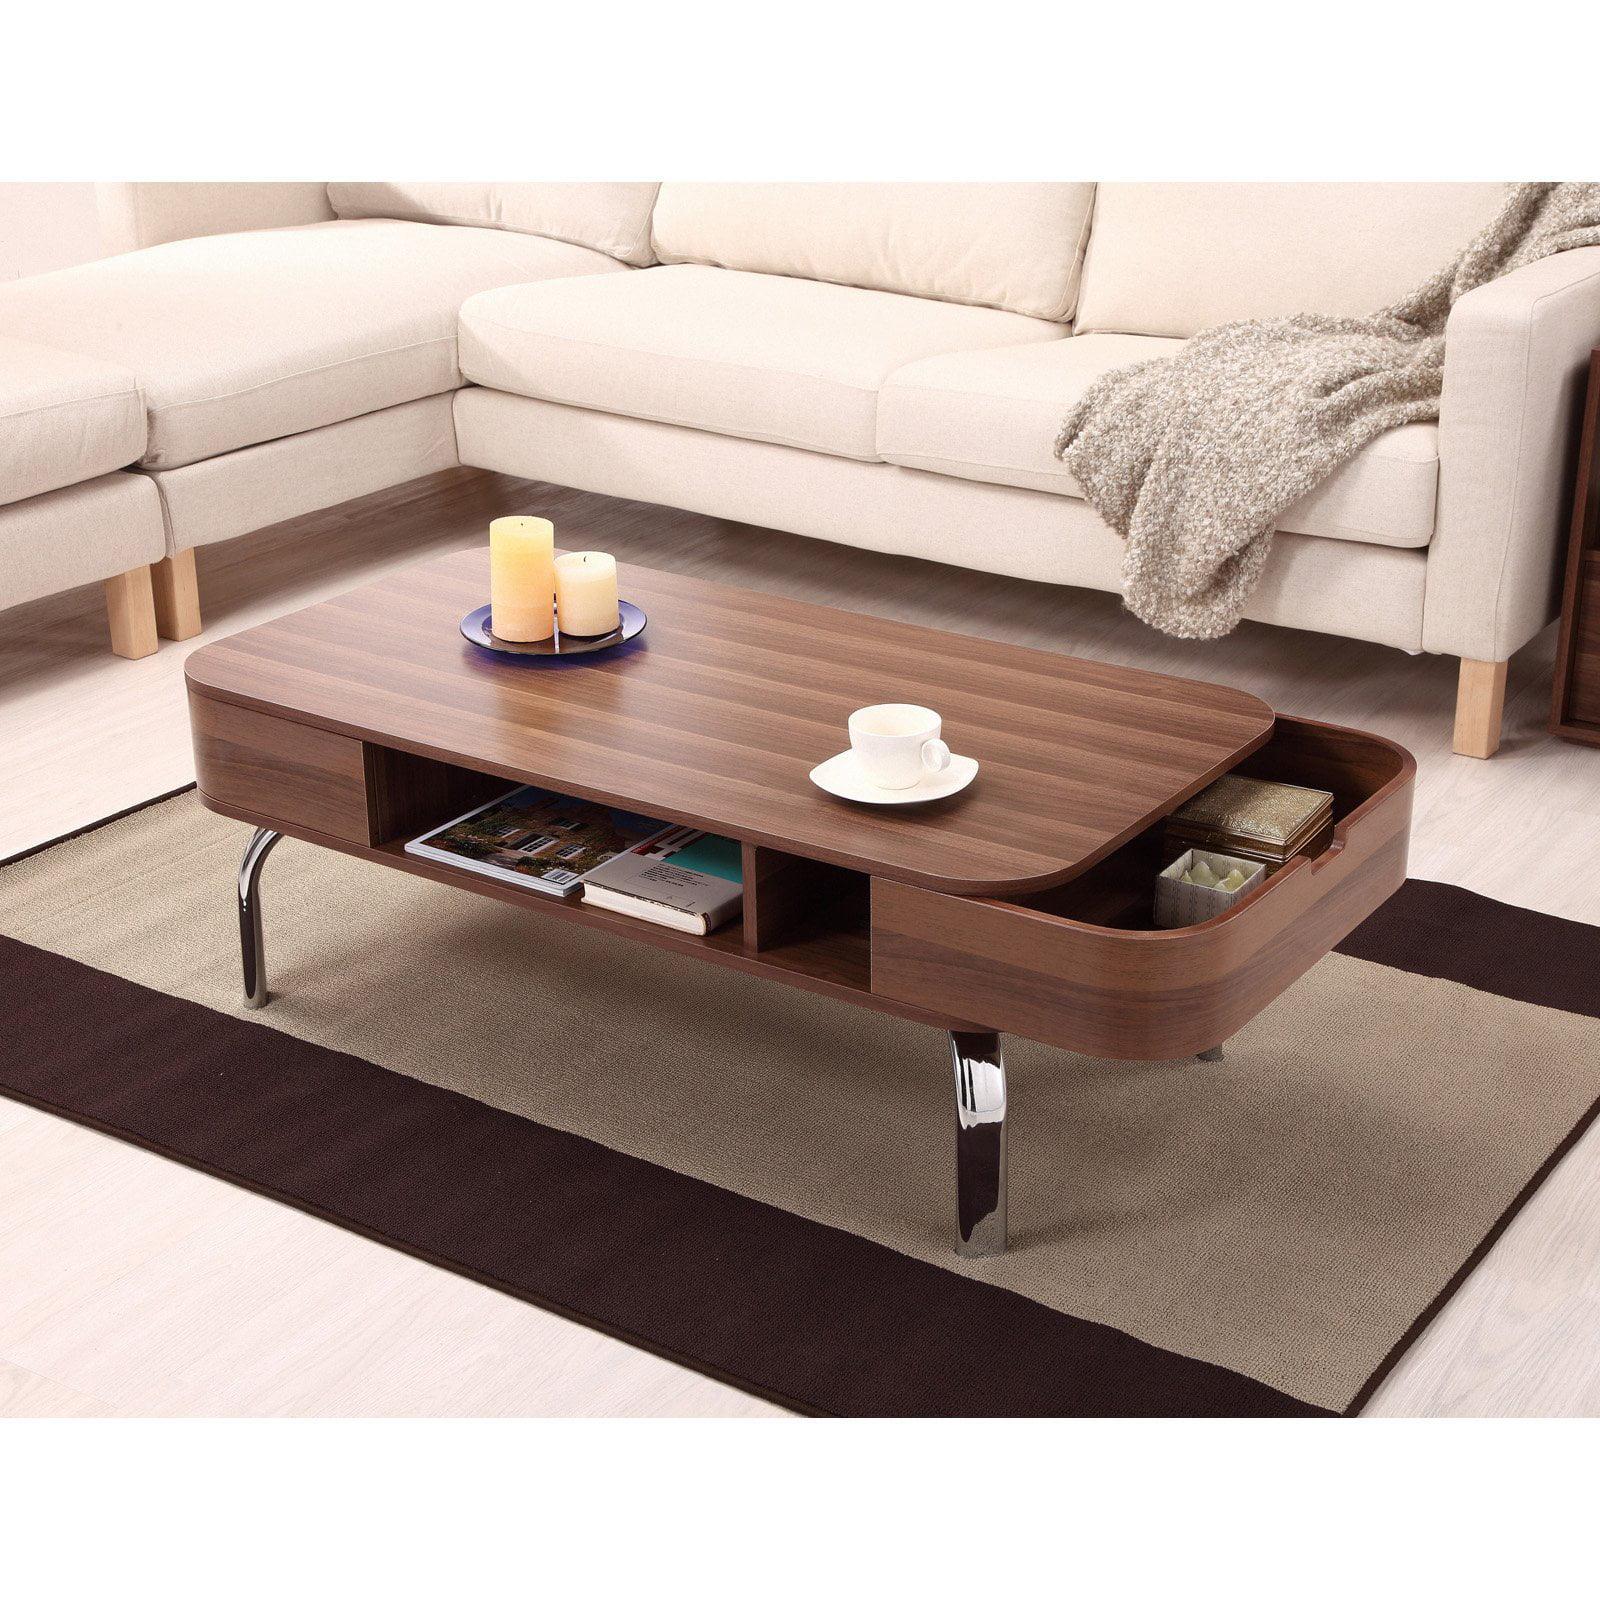 furniture of america lawson modern walnut drawer coffee table walmartcom. furniture of america lawson modern walnut drawer coffee table